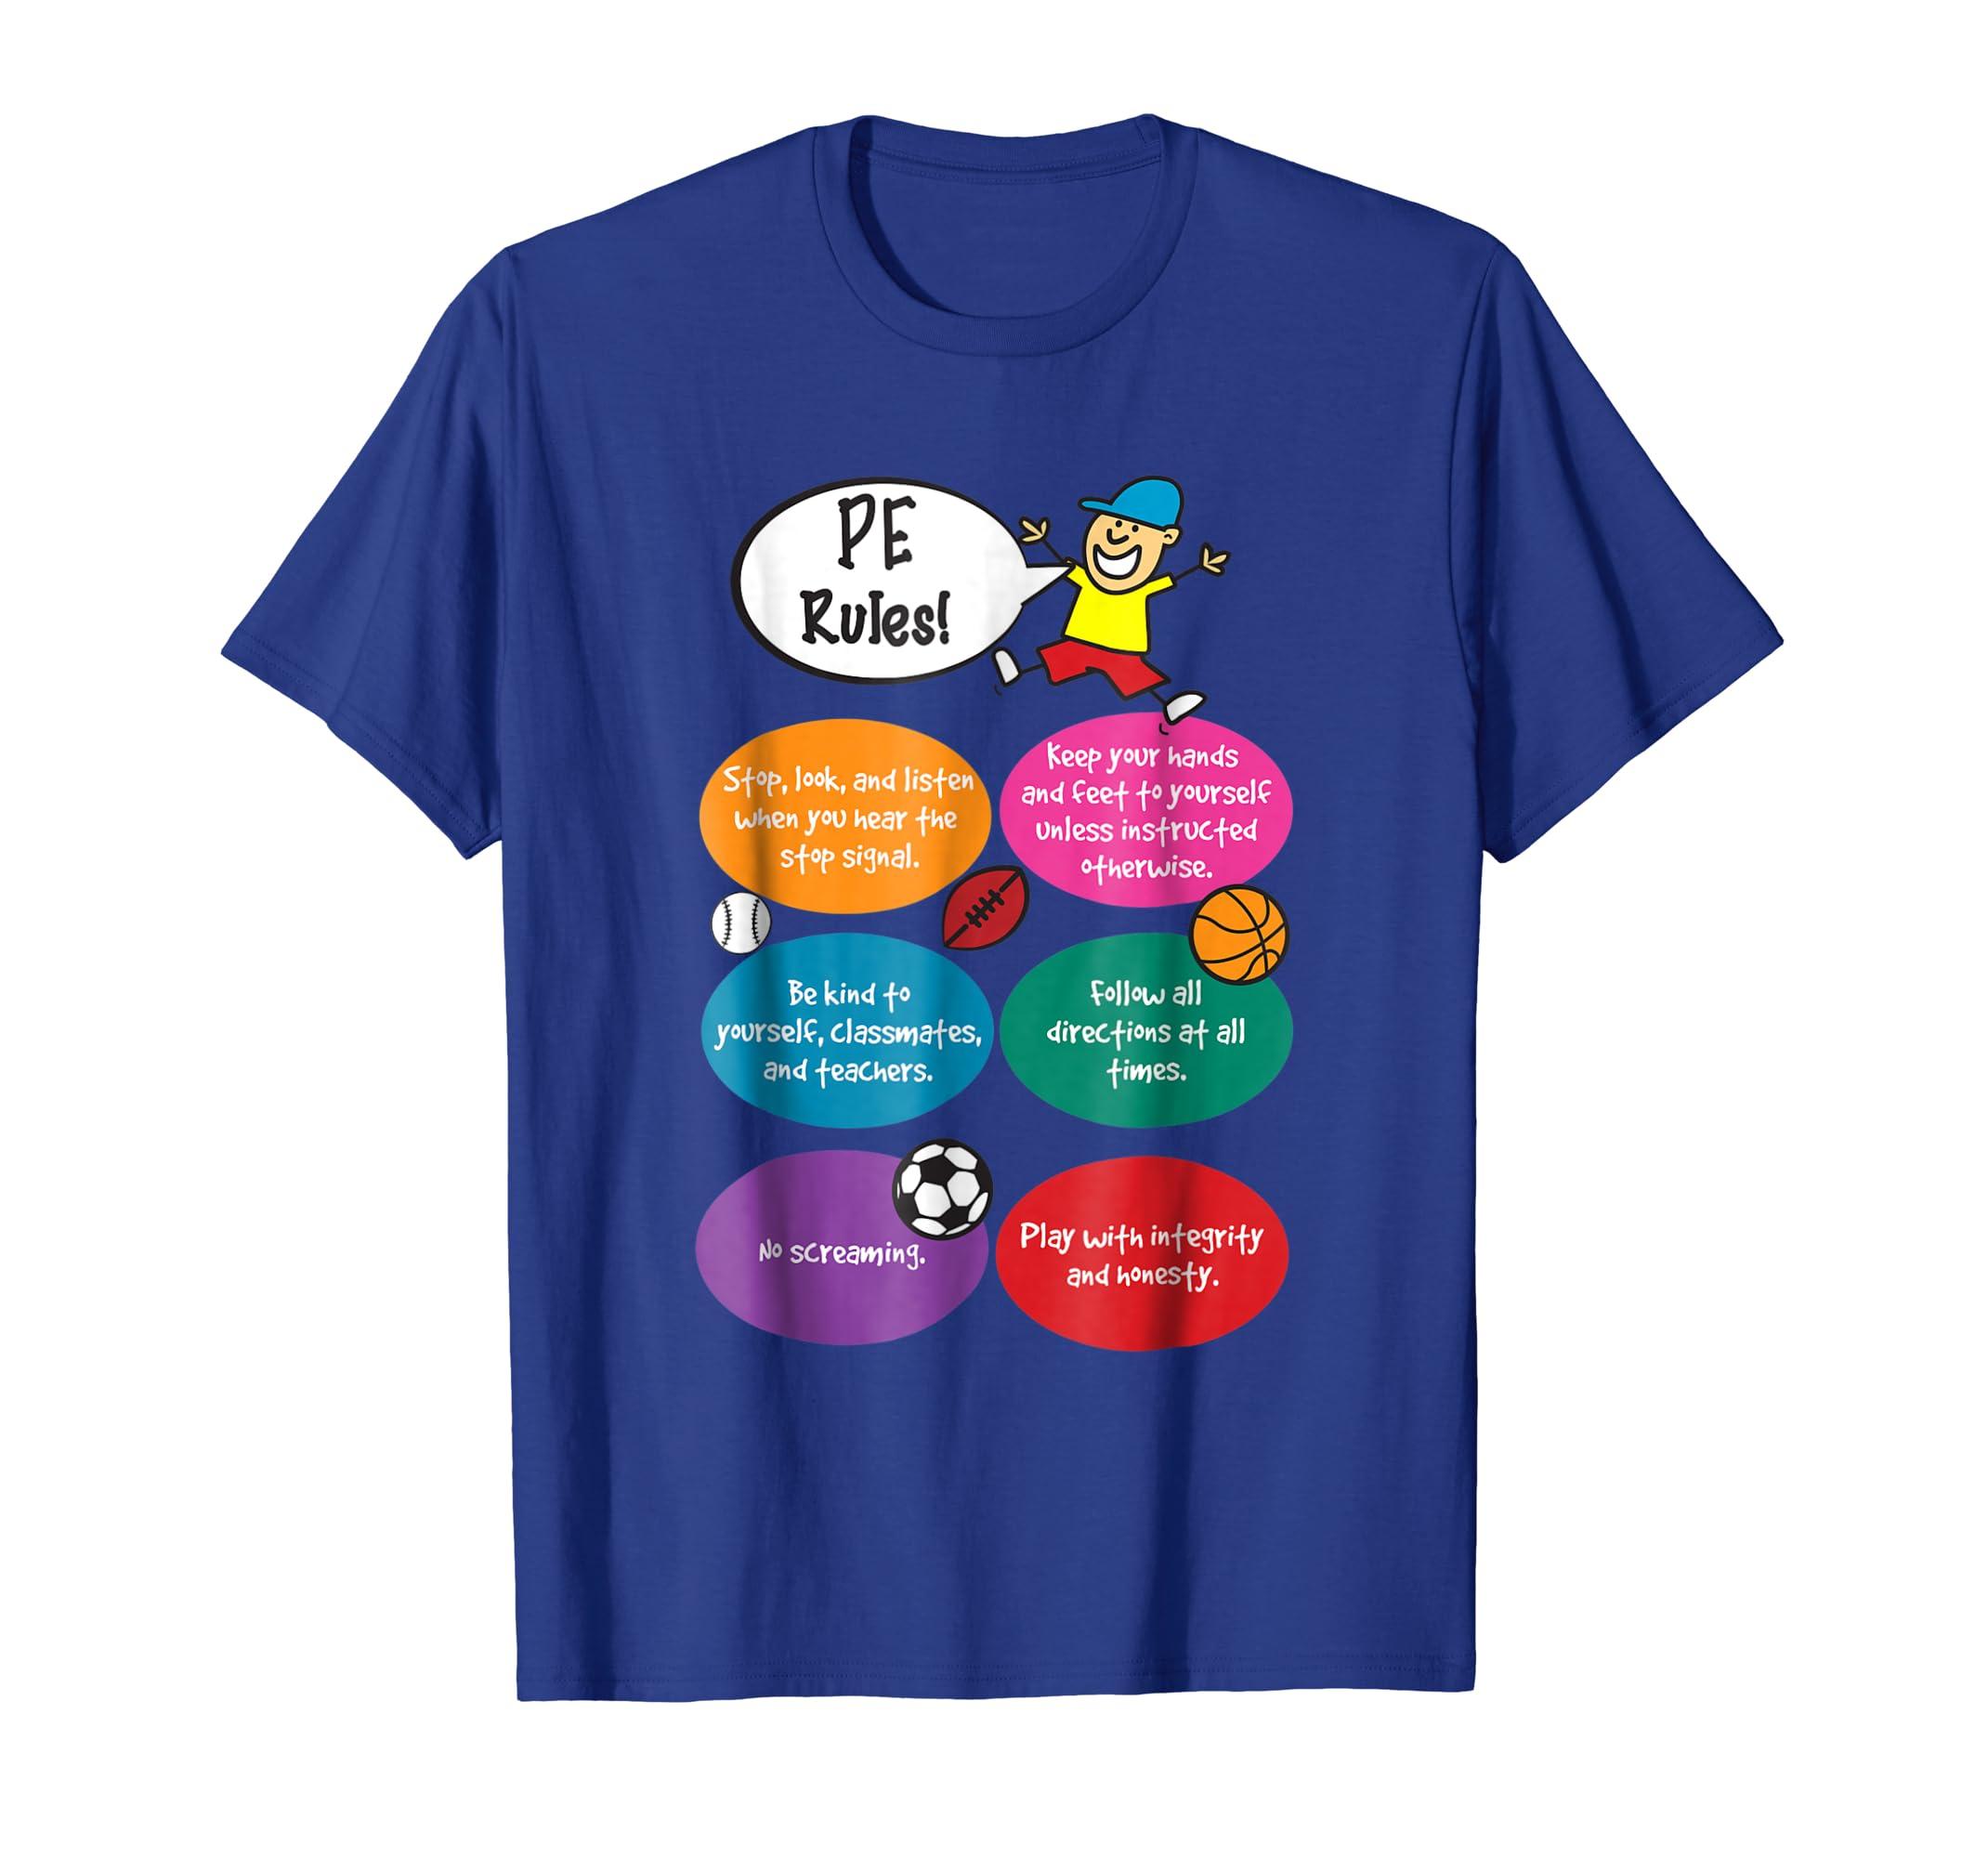 P.E. Rules Physical Education Teacher PE T-Shirt-mt